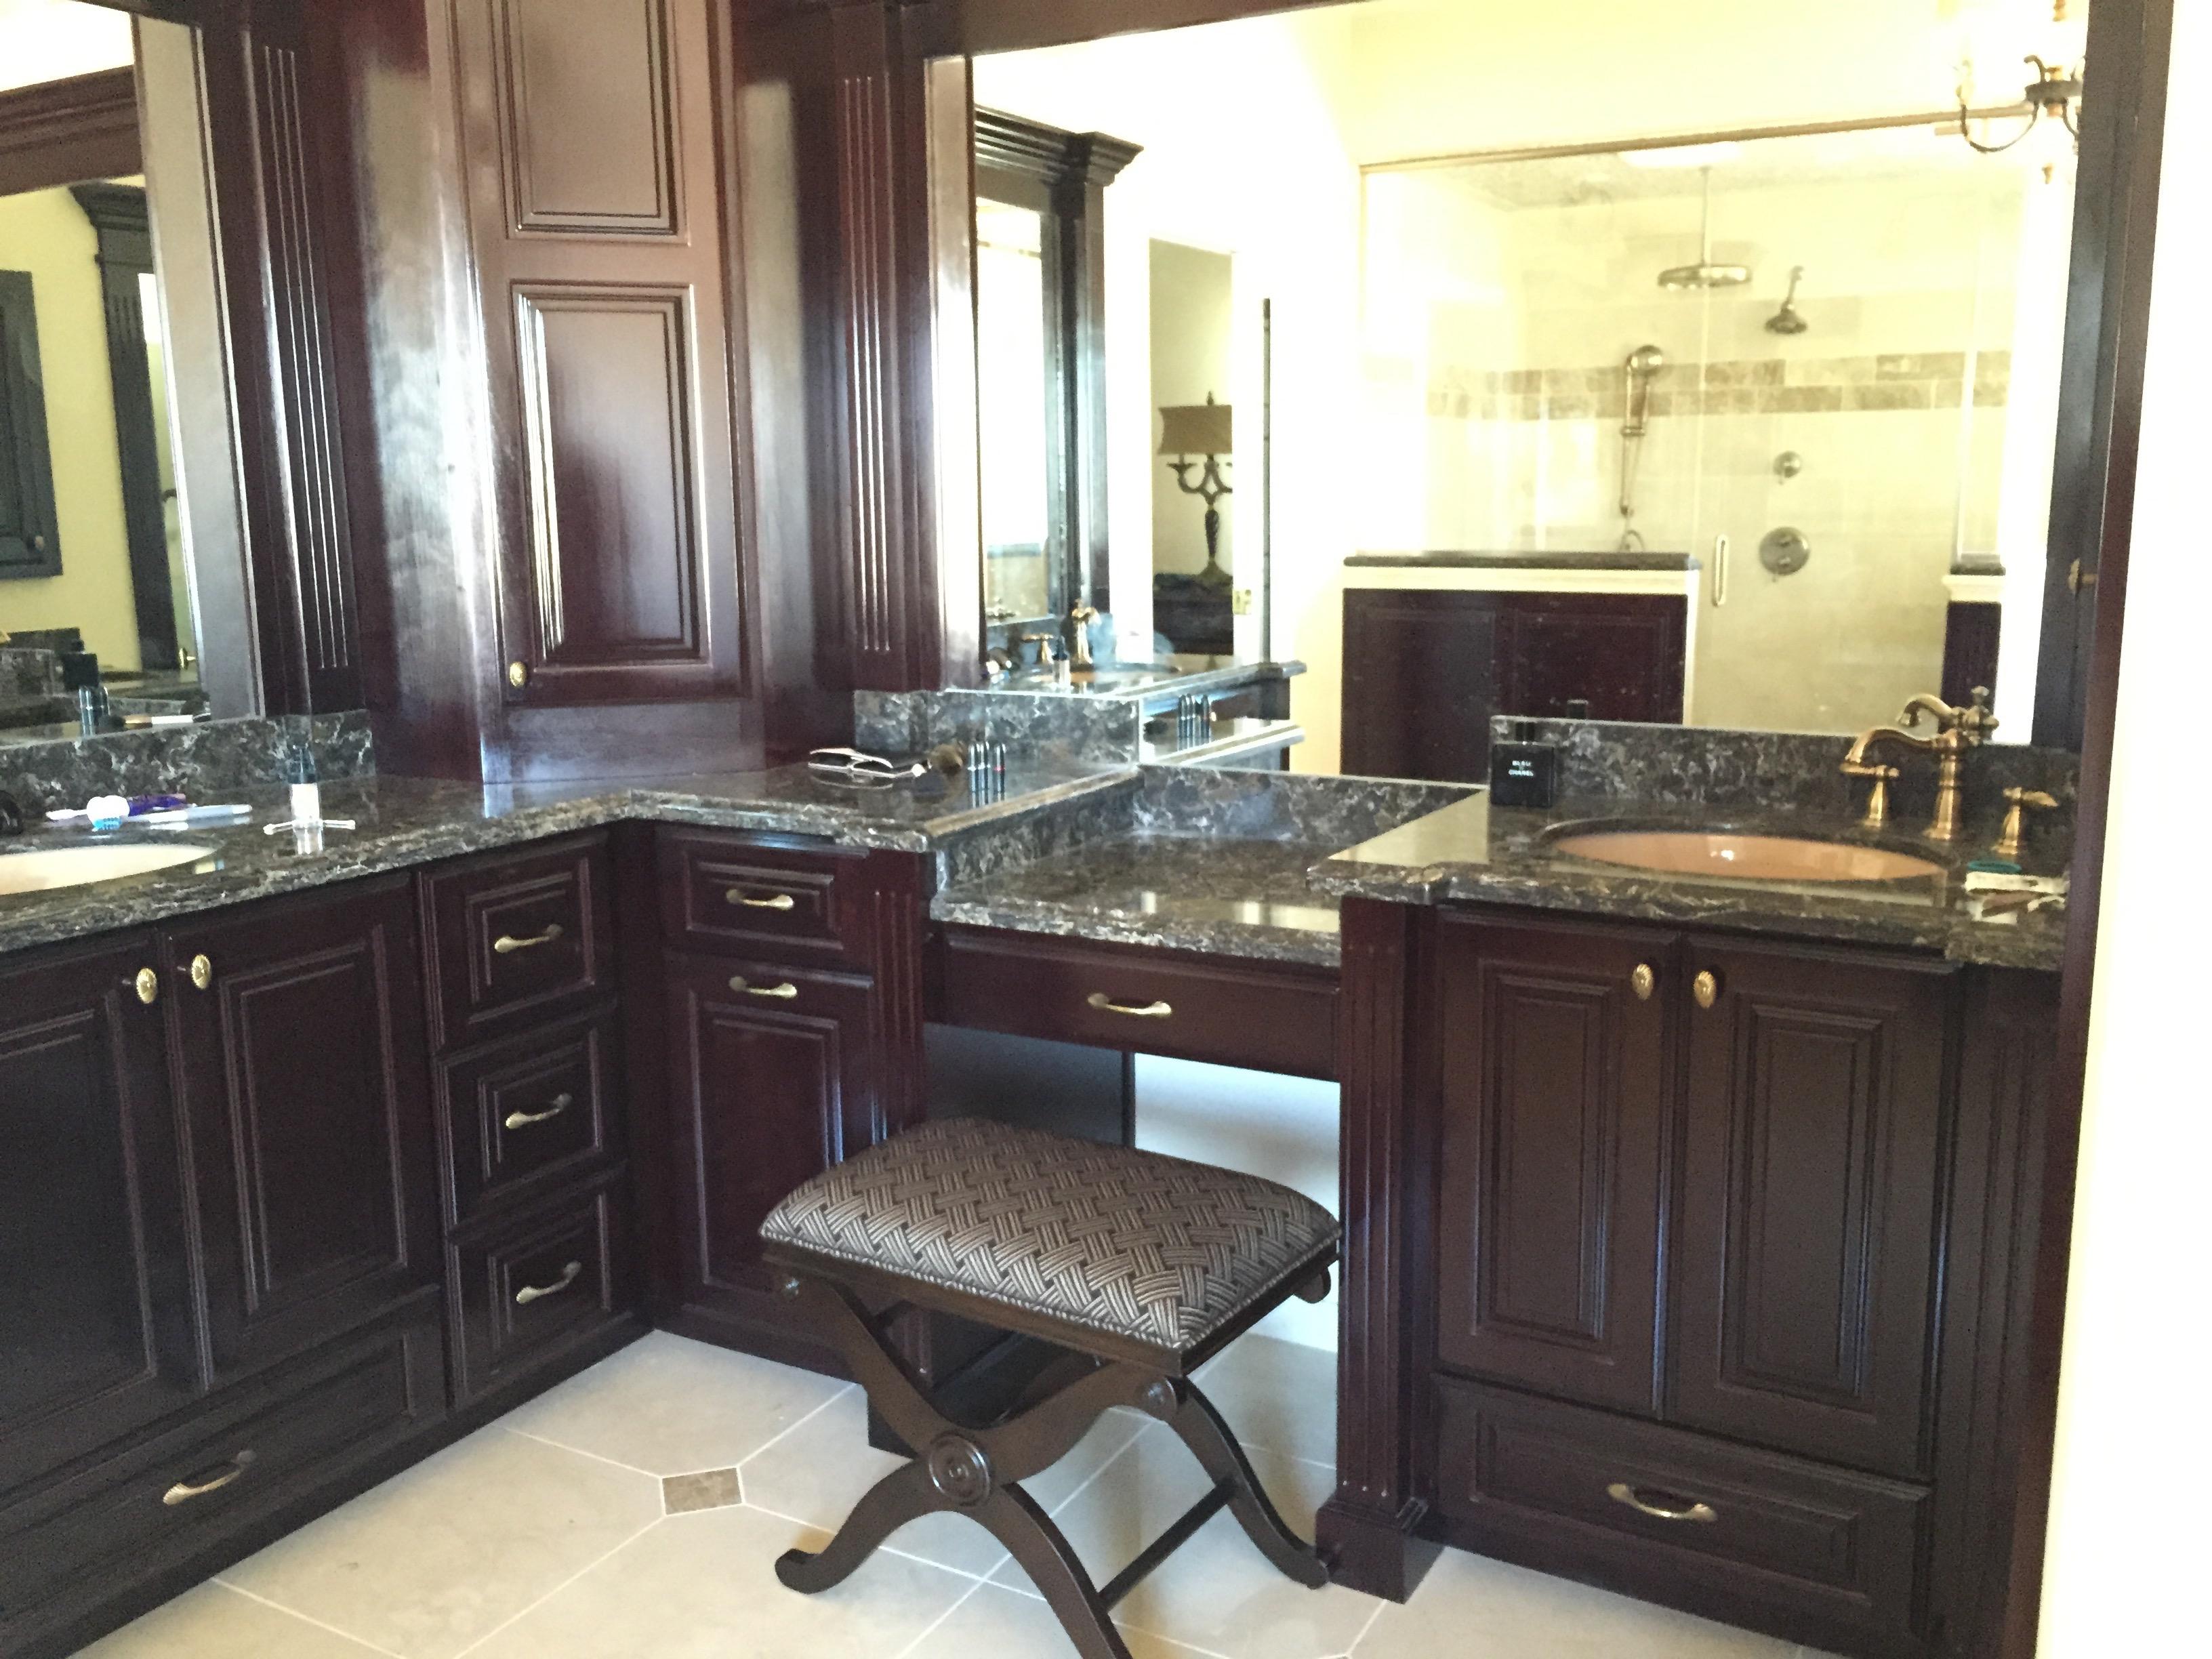 King 39 S Cabinets Construction Inc Sierra Vista Arizona Proview